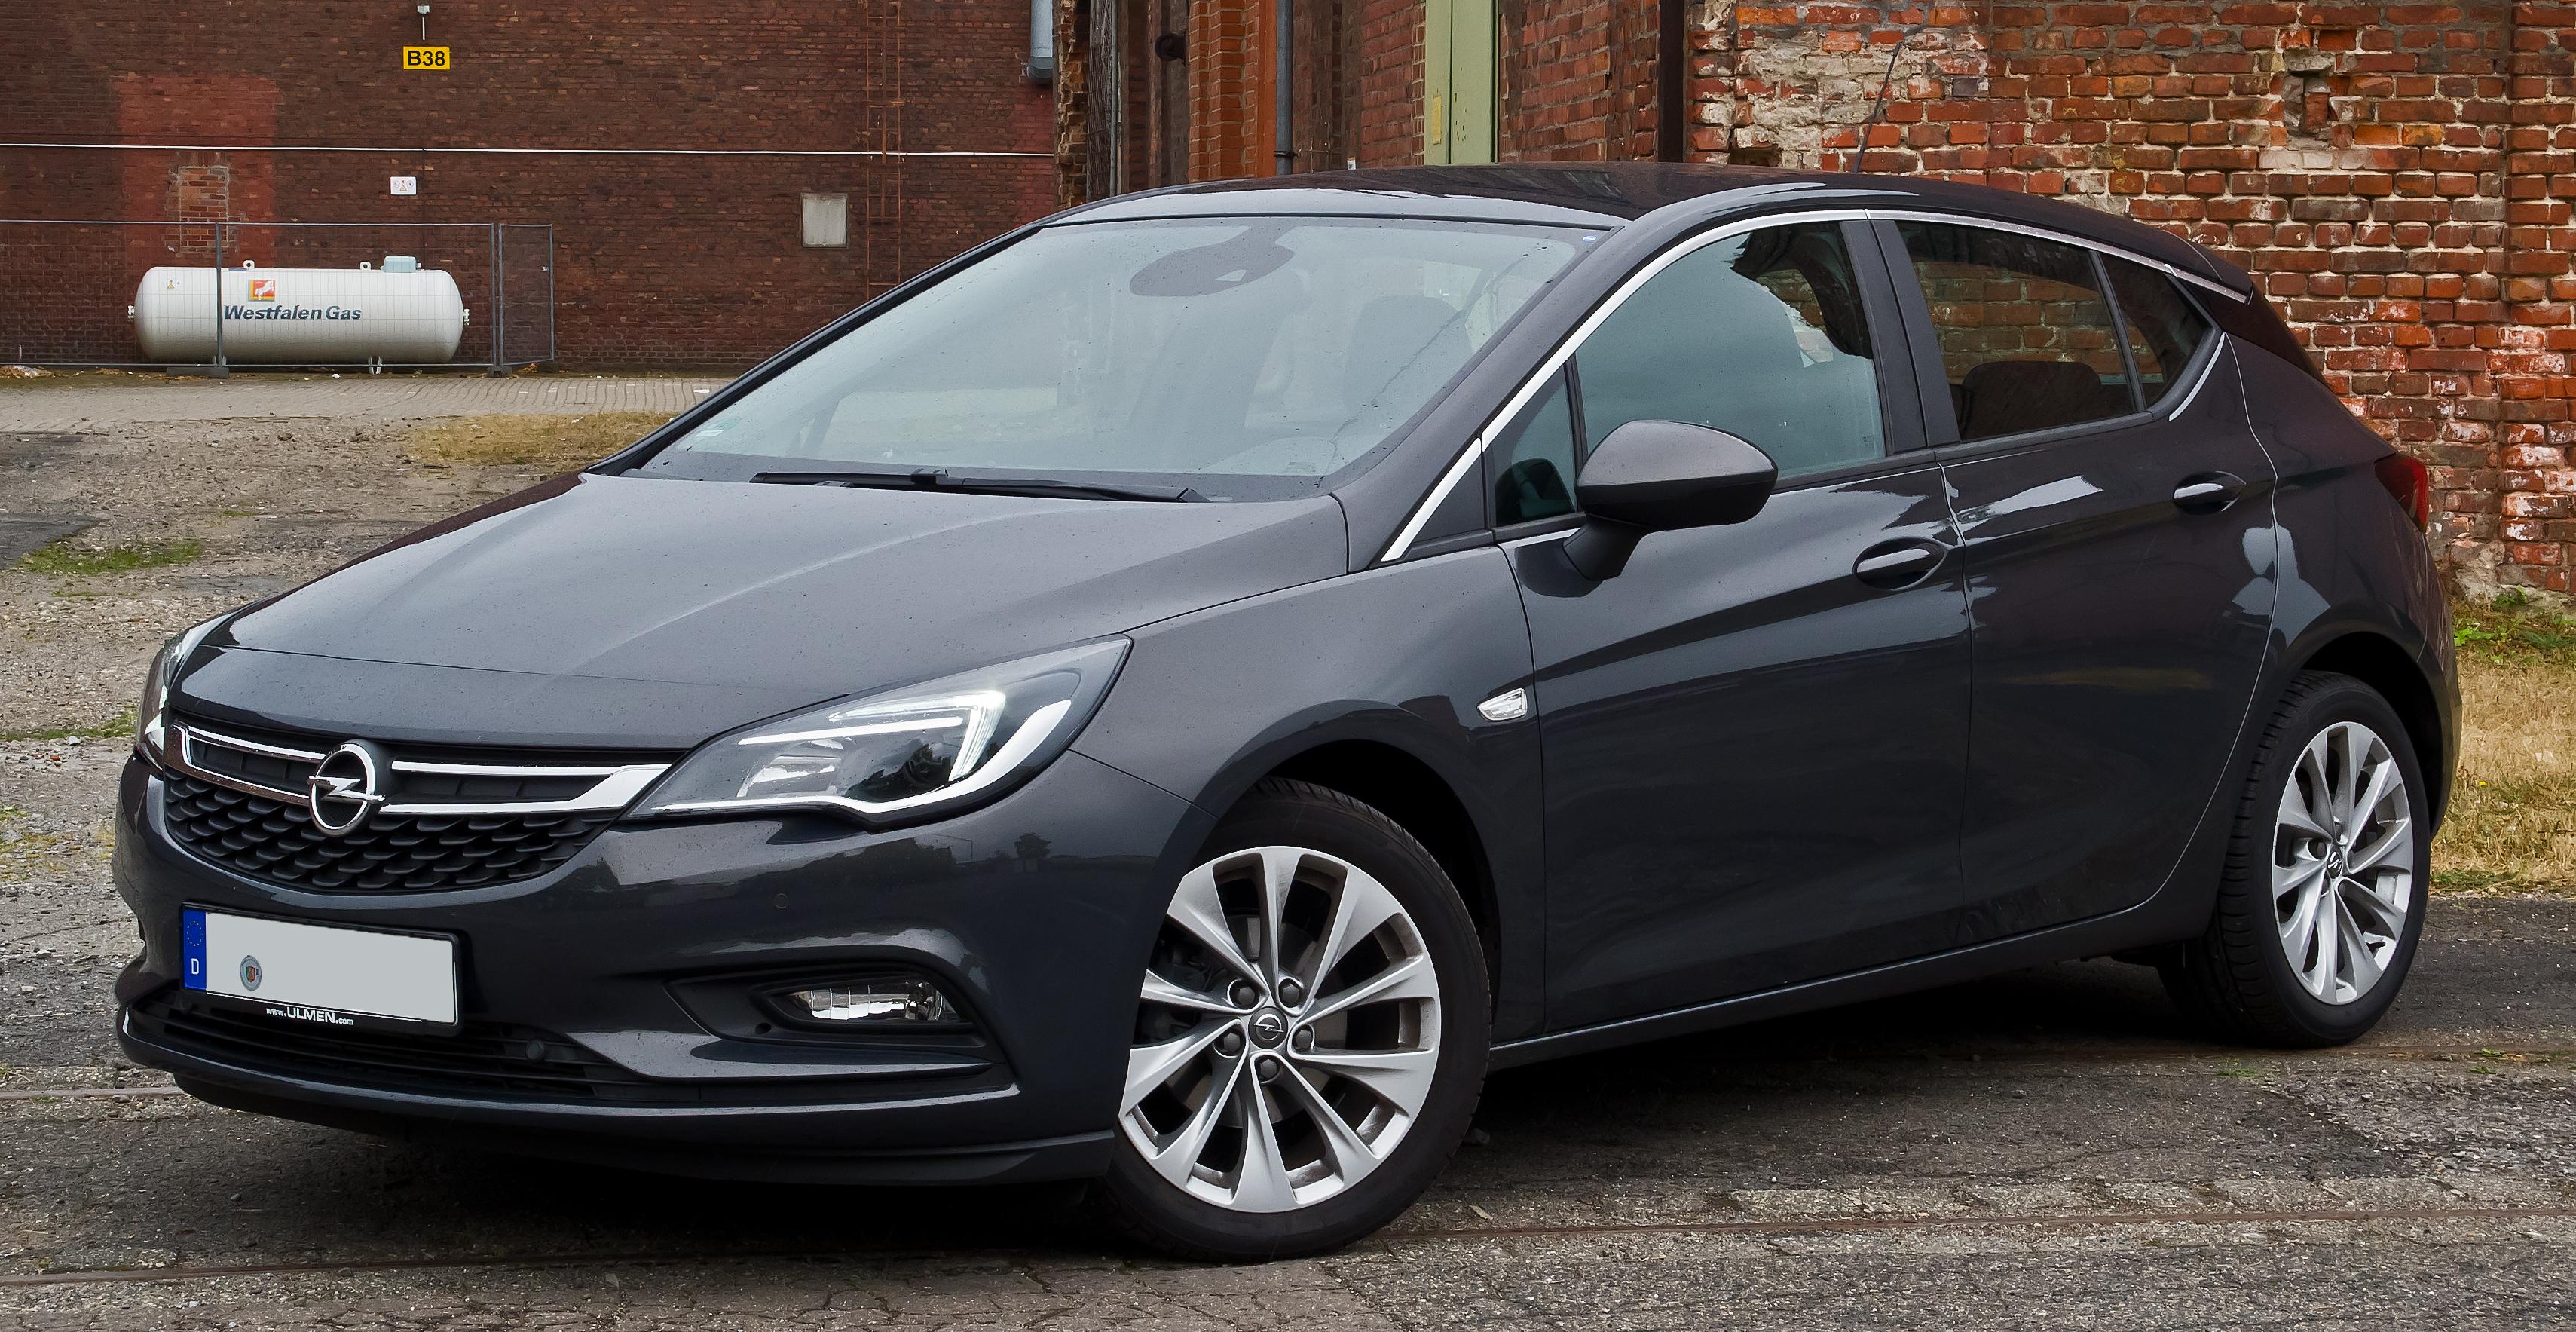 Astra Sedan 2018 >> File:Opel Astra 1.4 EDIT Edition (K) – Frontansicht (1), 31. Juli 2016, Düsseldorf.jpg ...